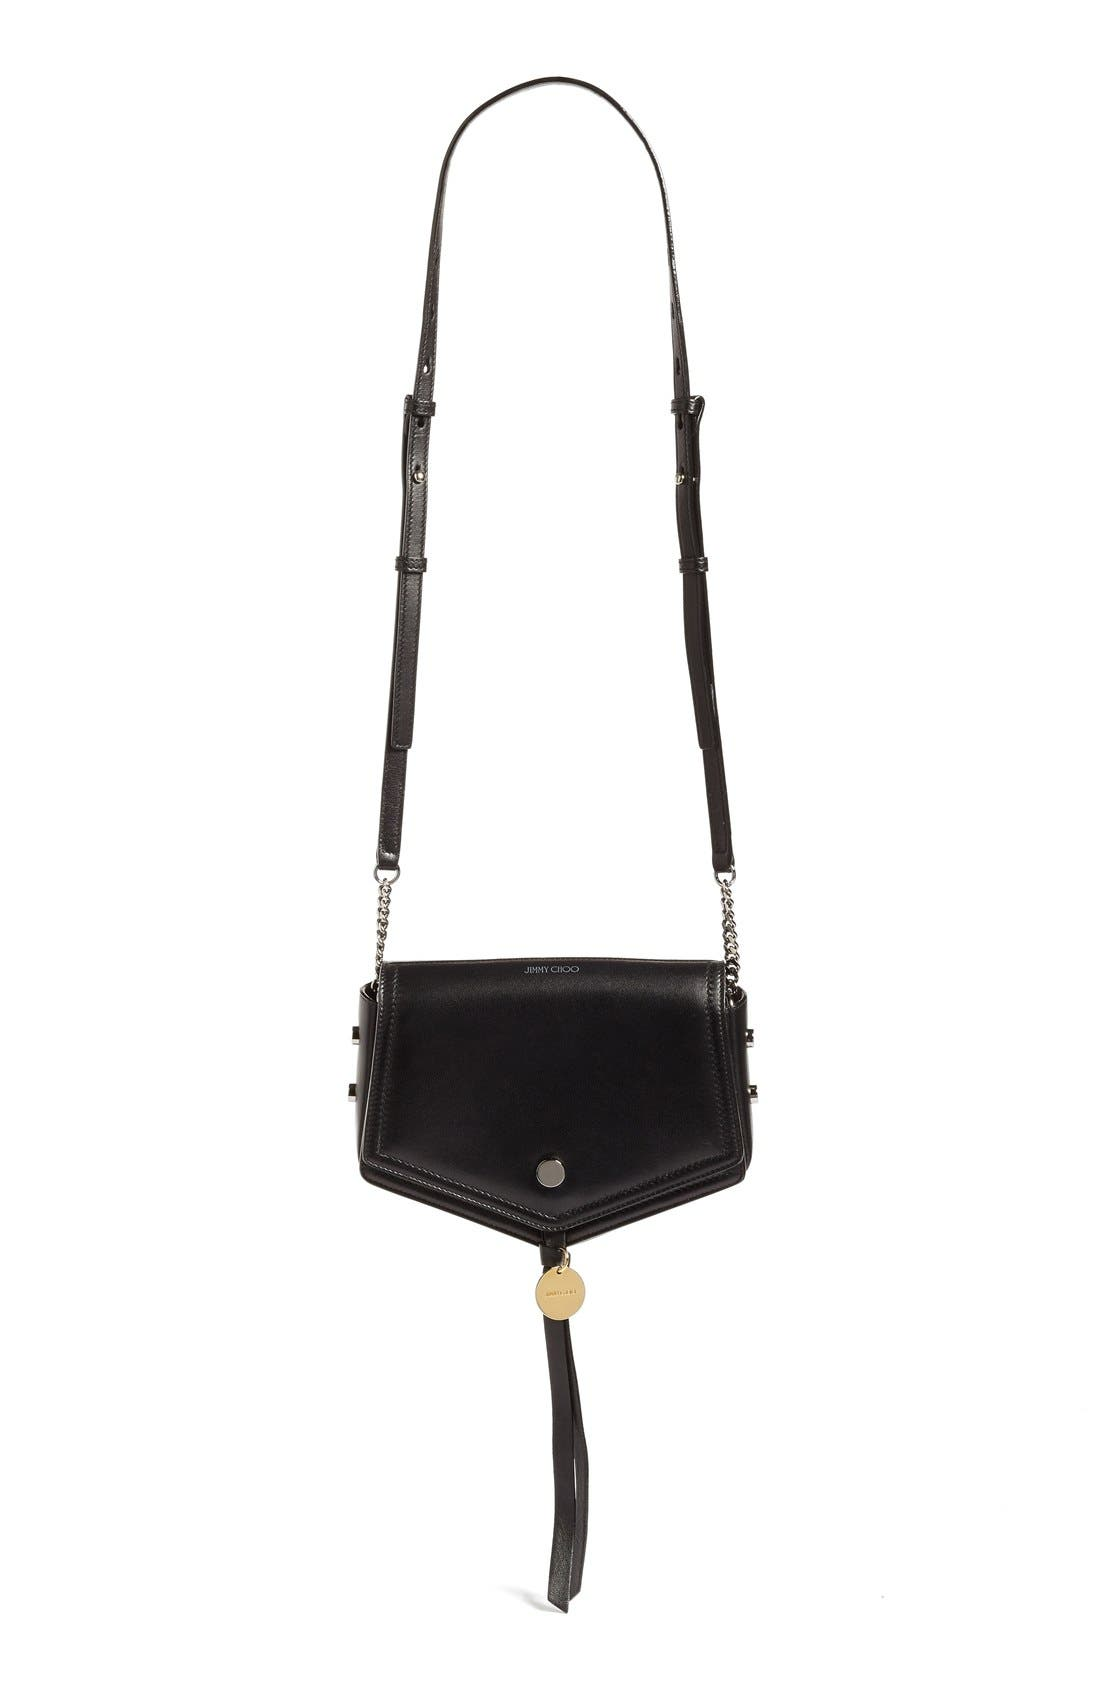 Main Image - Jimmy Choo Arrow Leather Shoulder Bag